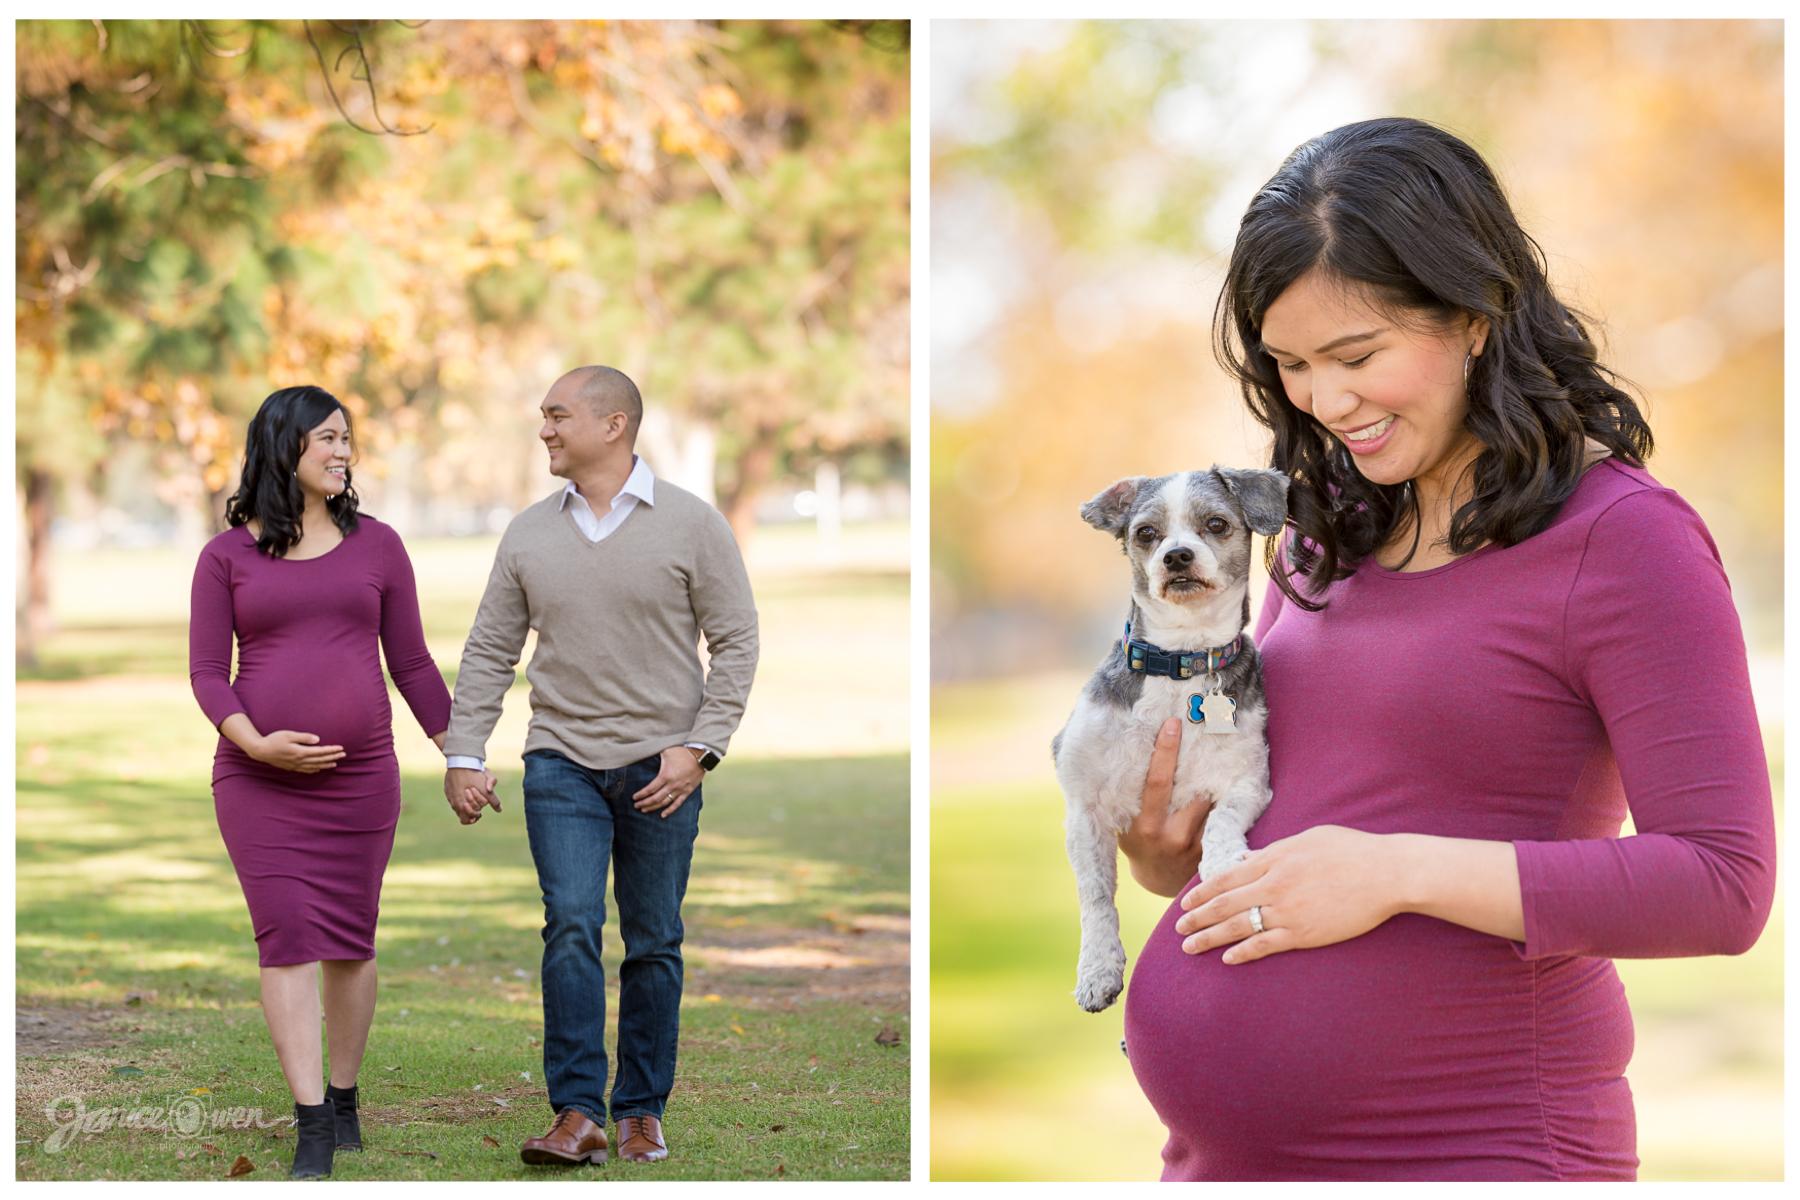 janiceowenphotography_maternity12.jpg